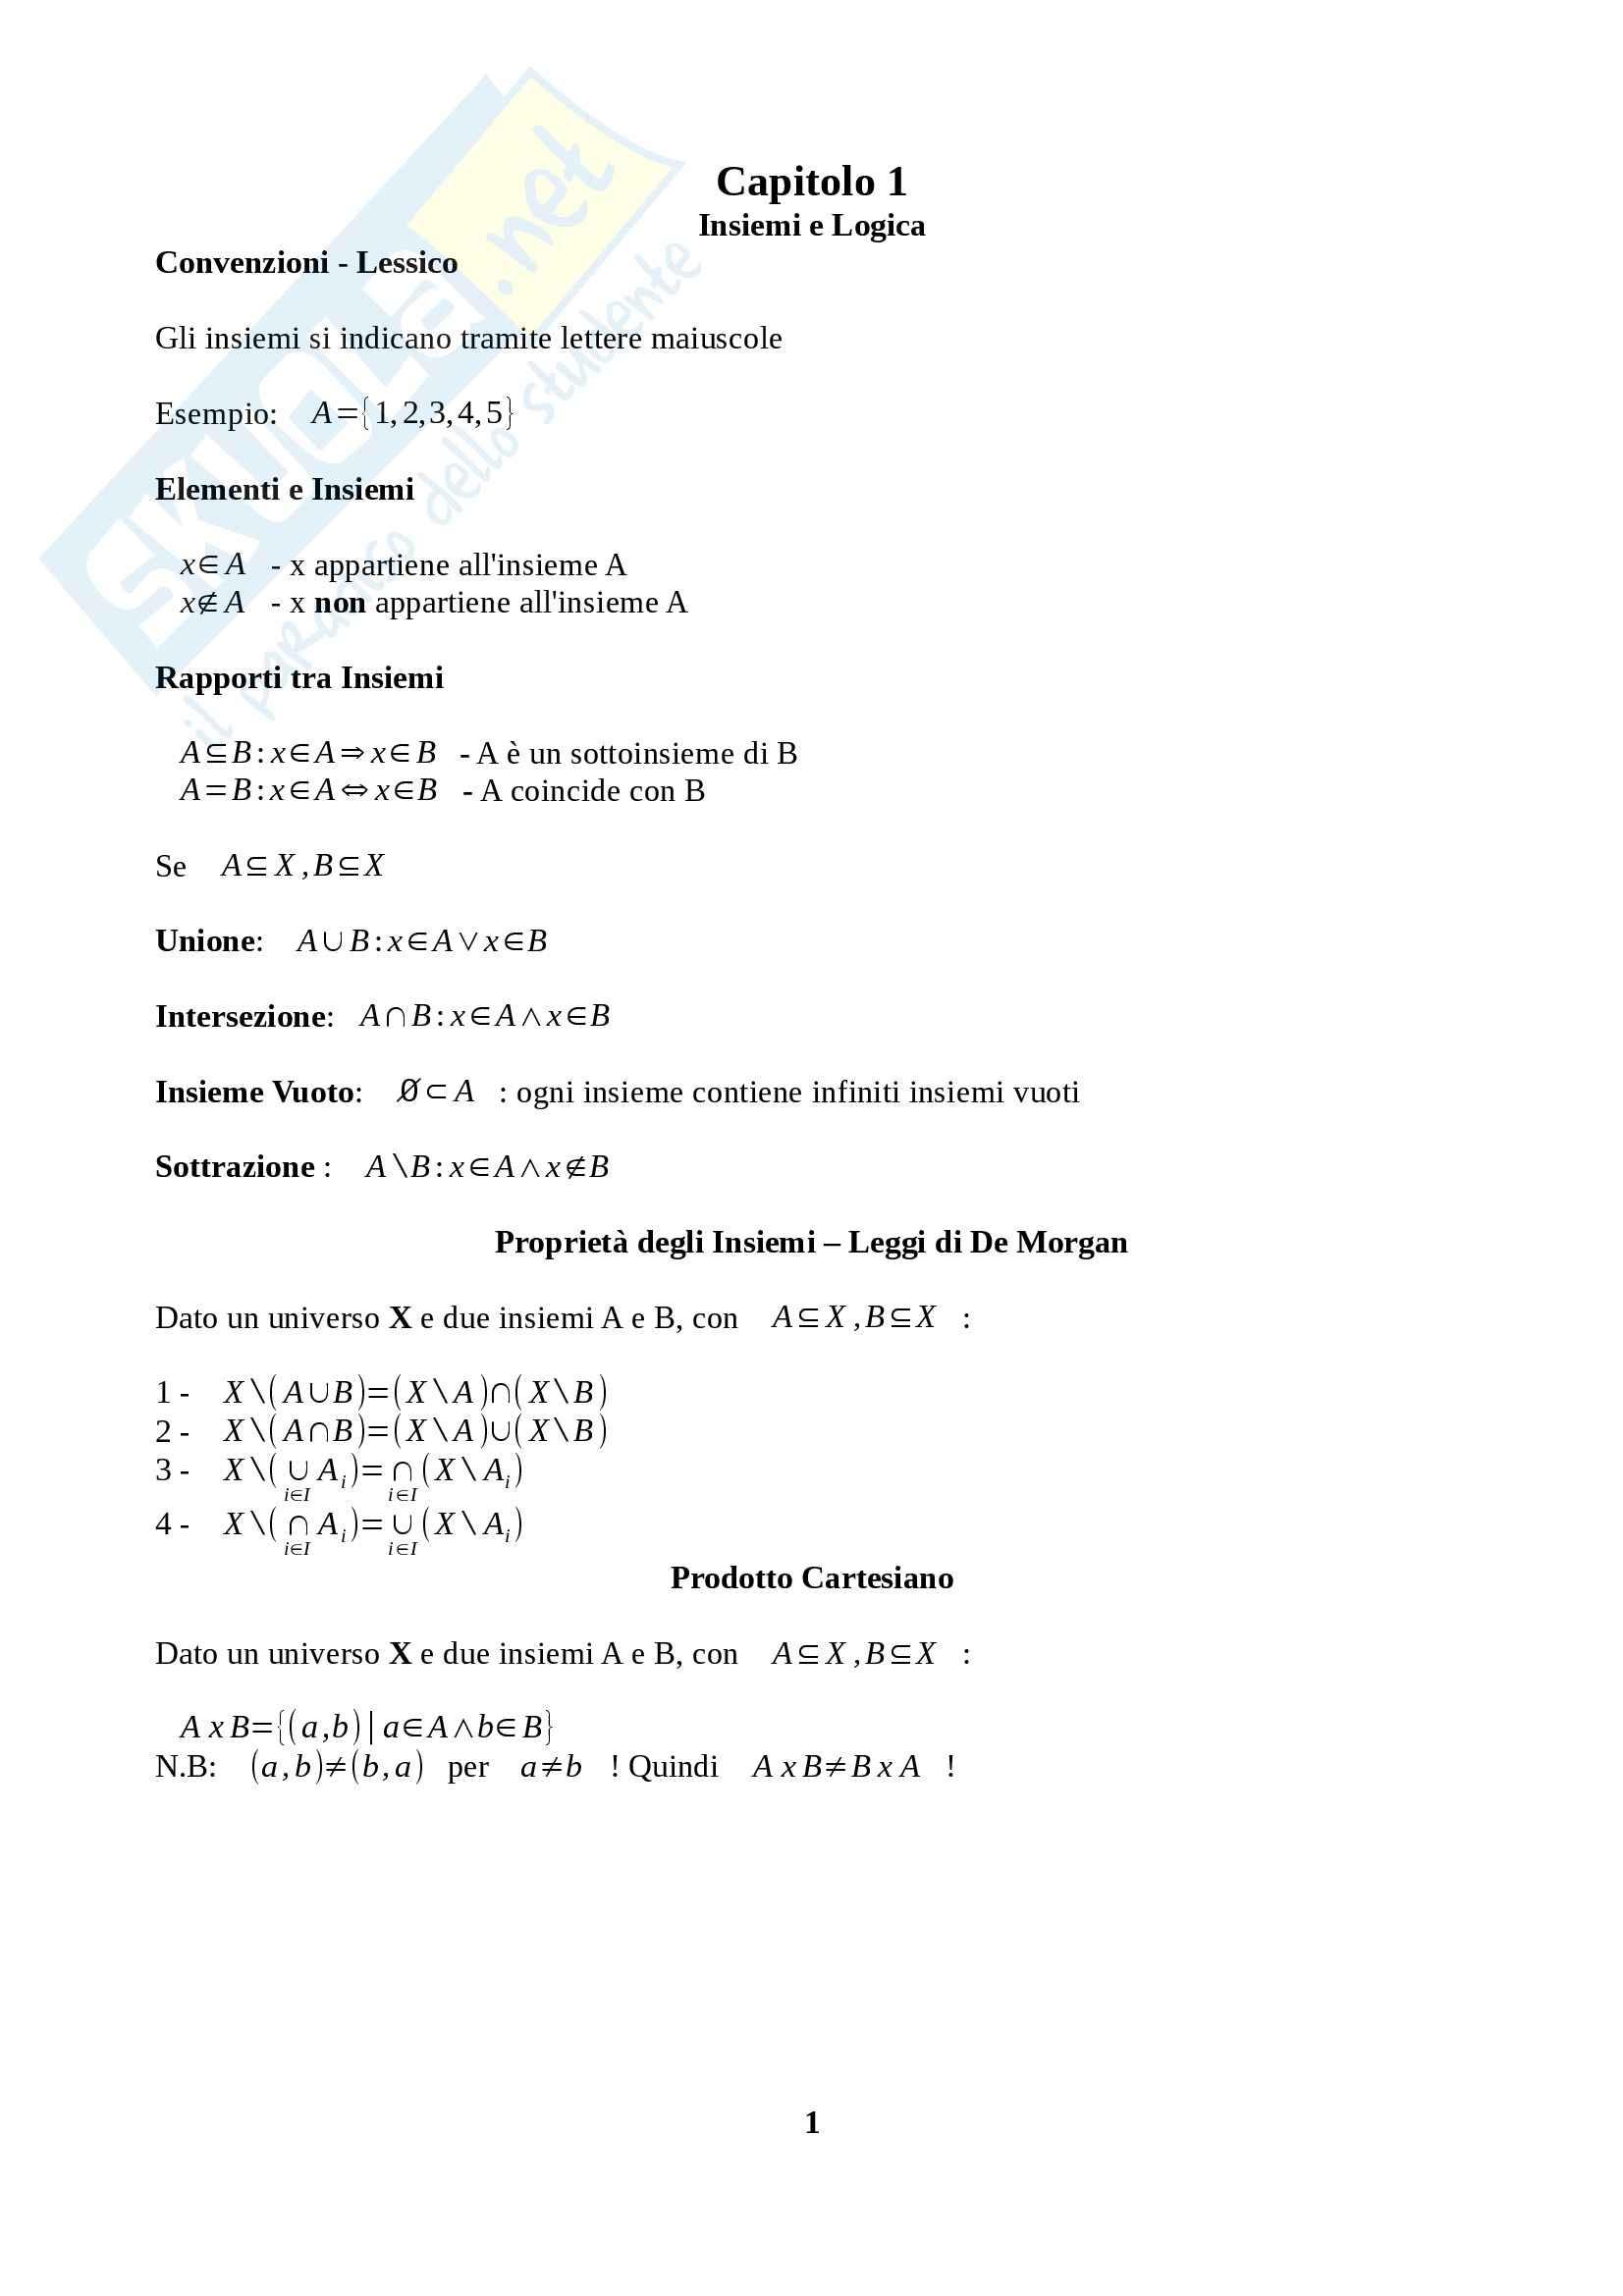 appunto N. Garofalo Fondamenti di Analisi 1 per l'ingegneria